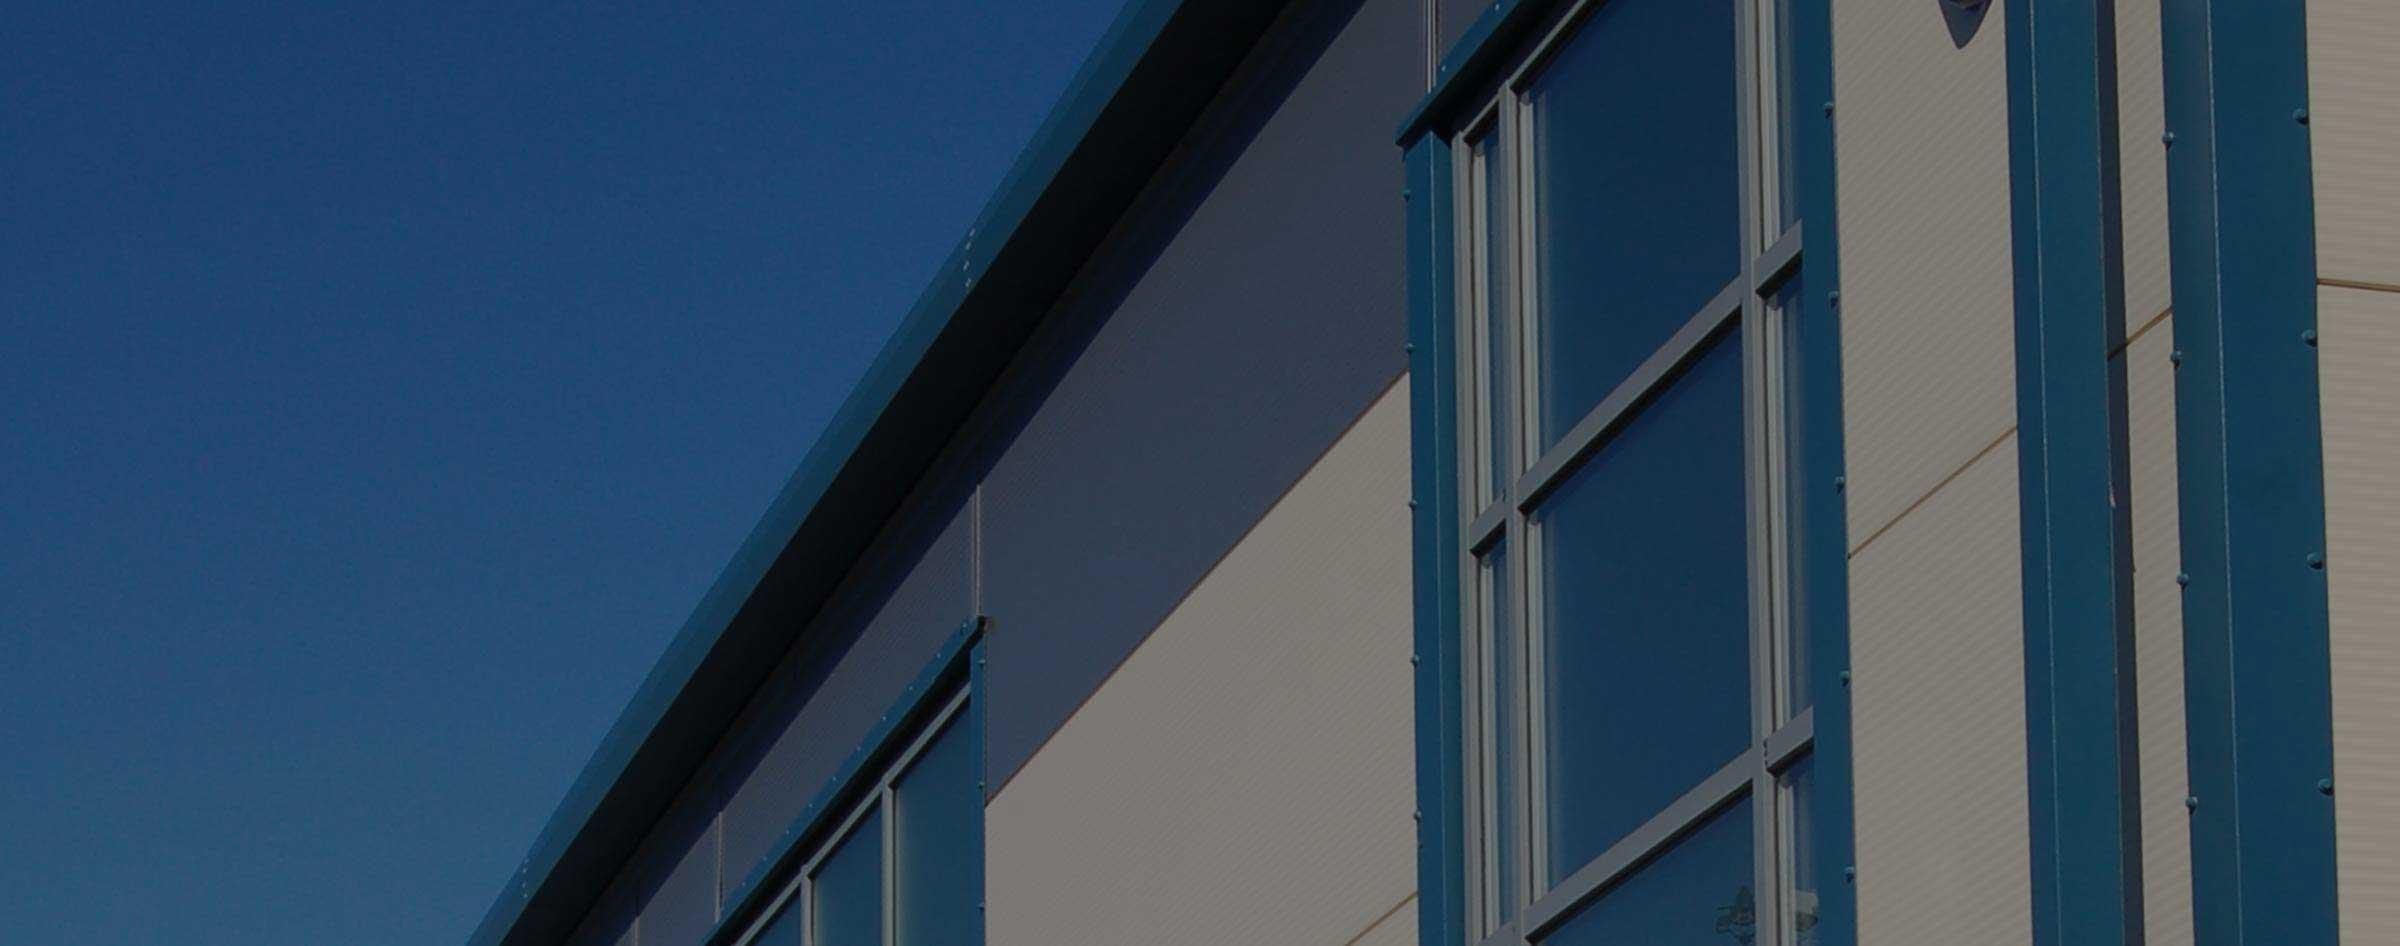 Architecture-KADa.jpg